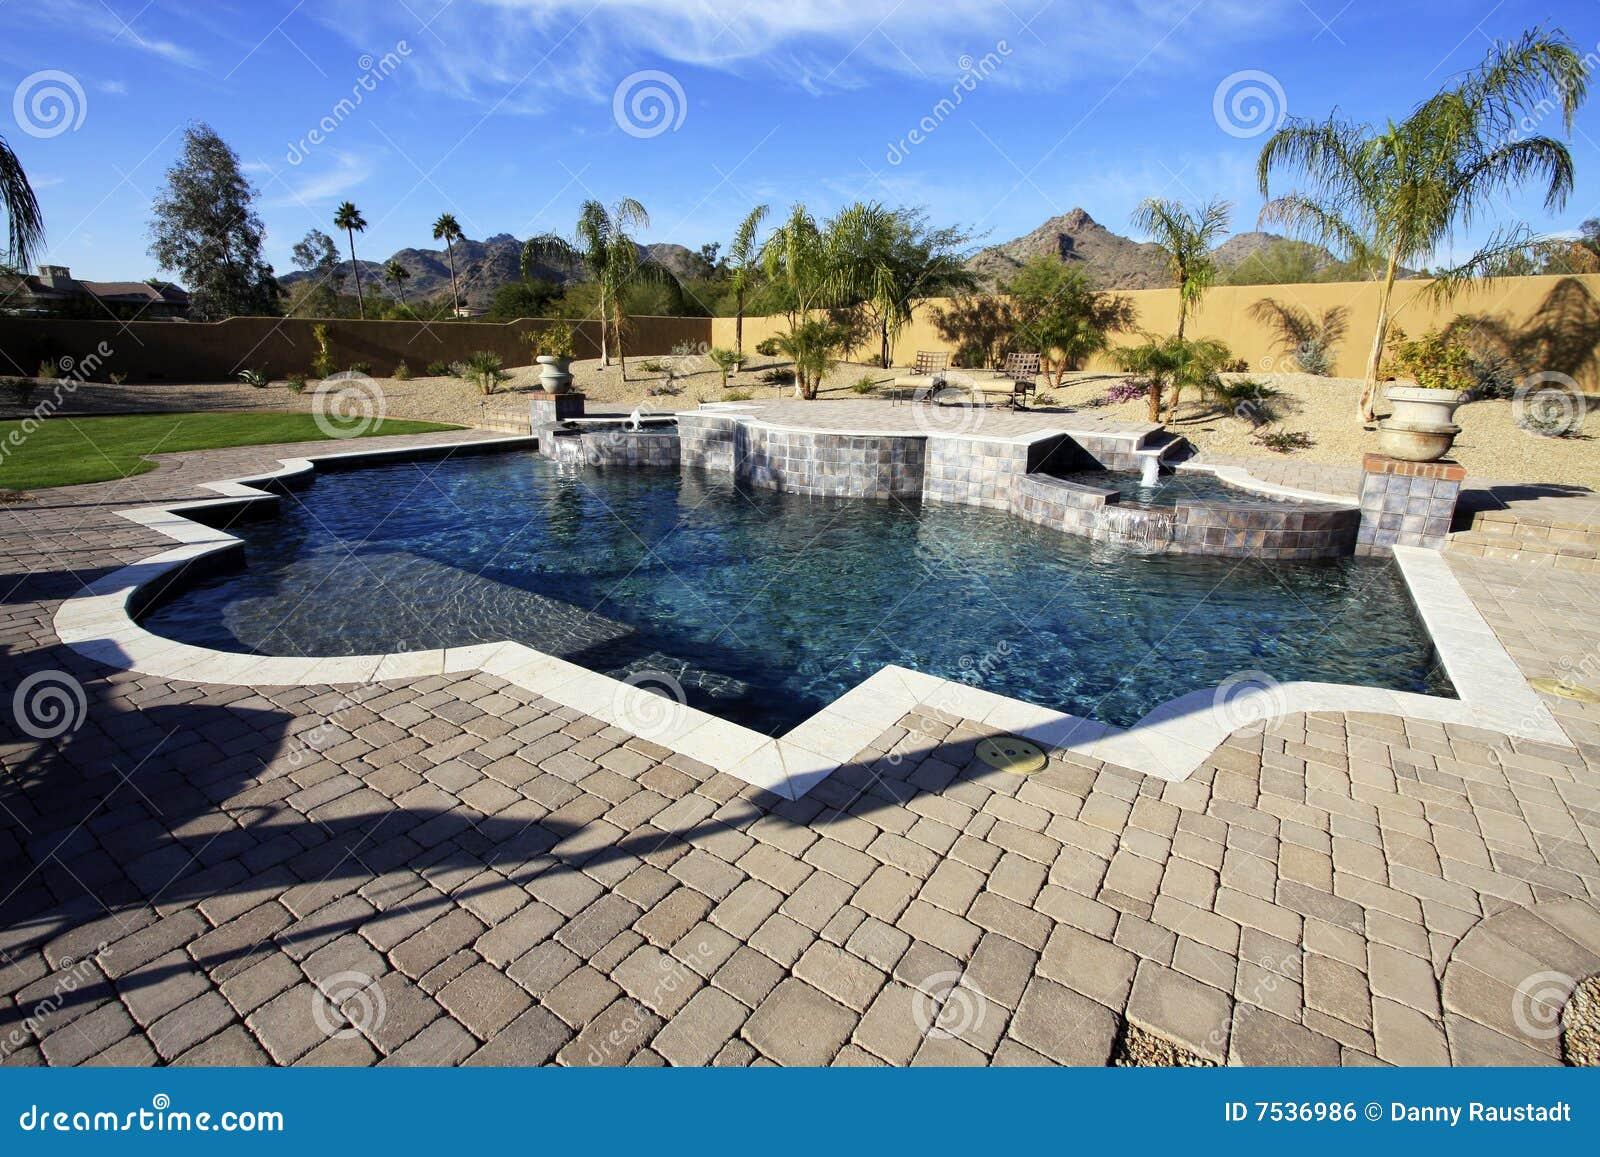 Desert luxury pool spa